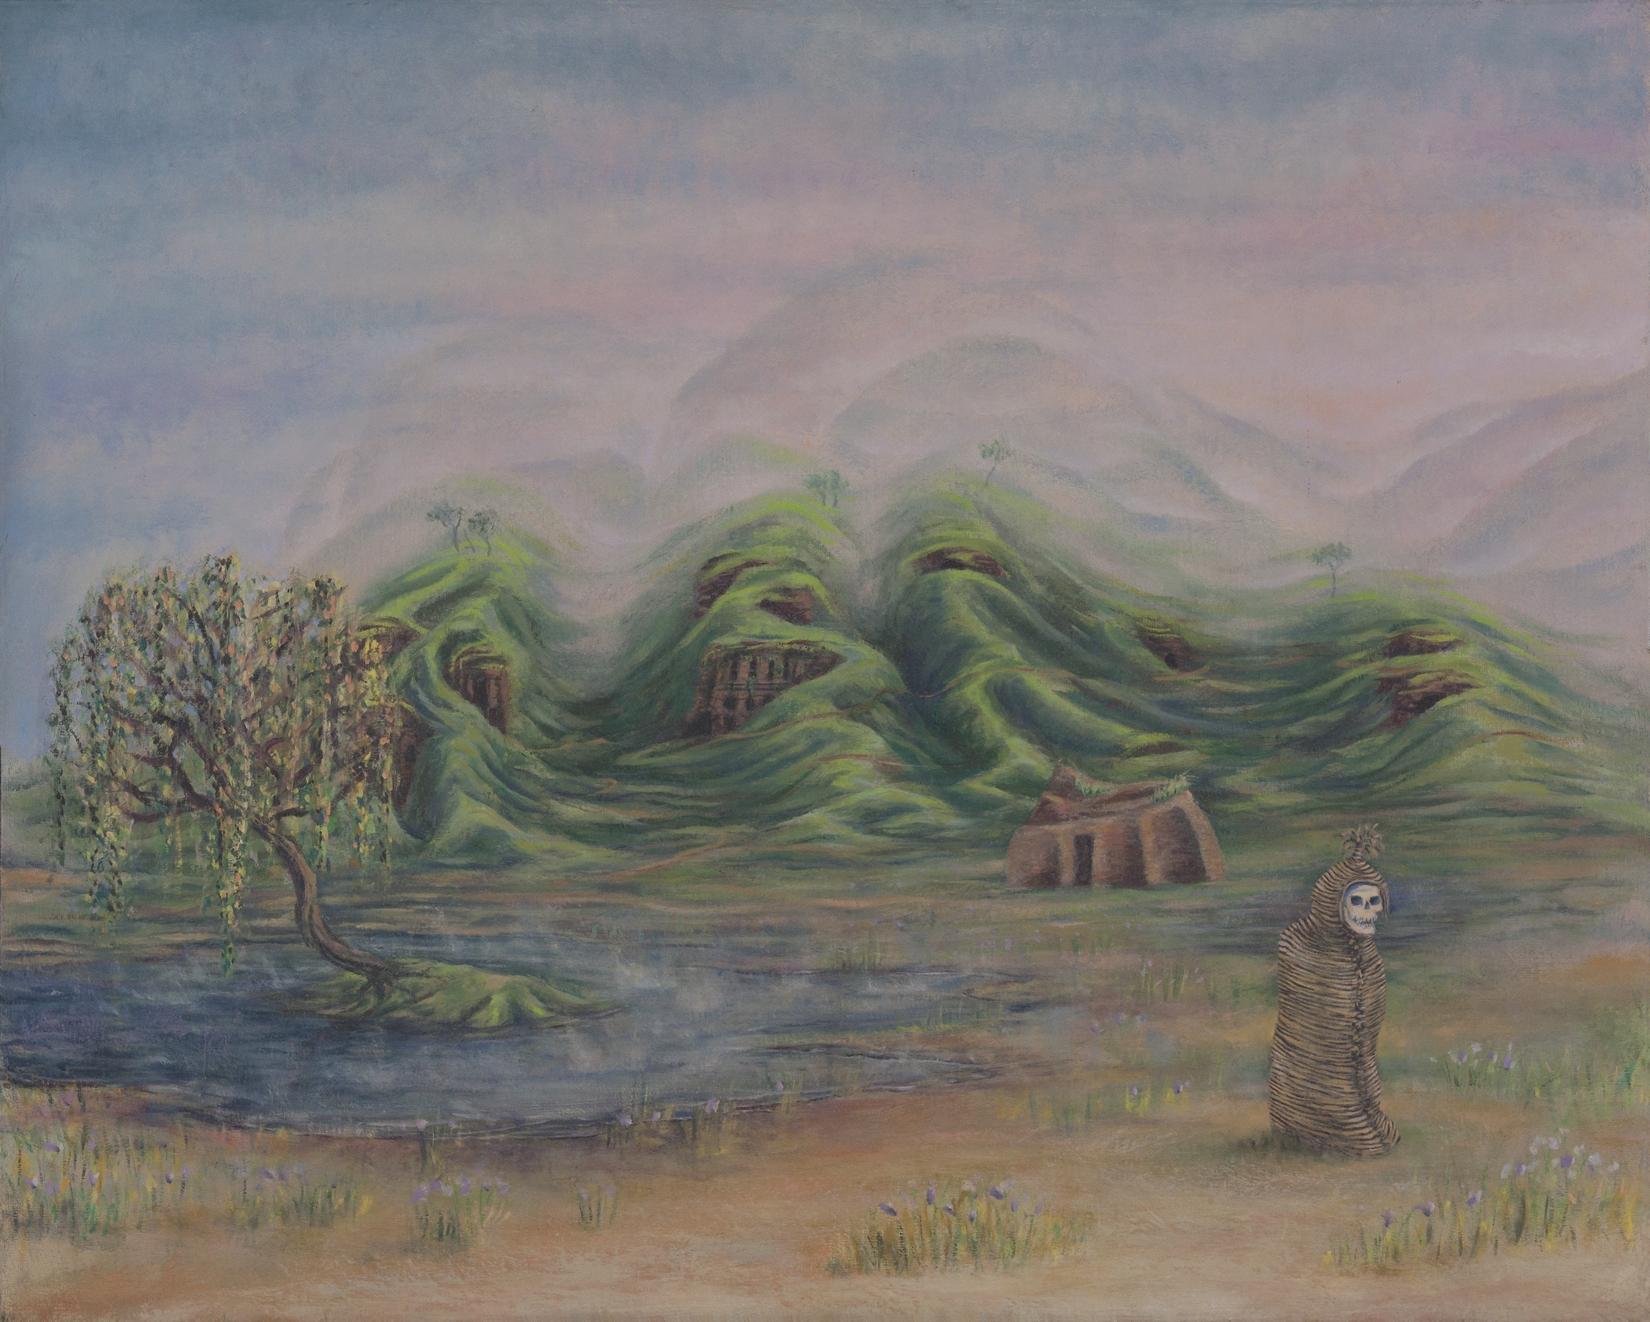 Bolivia - oil on canvas panel, 16 x 20